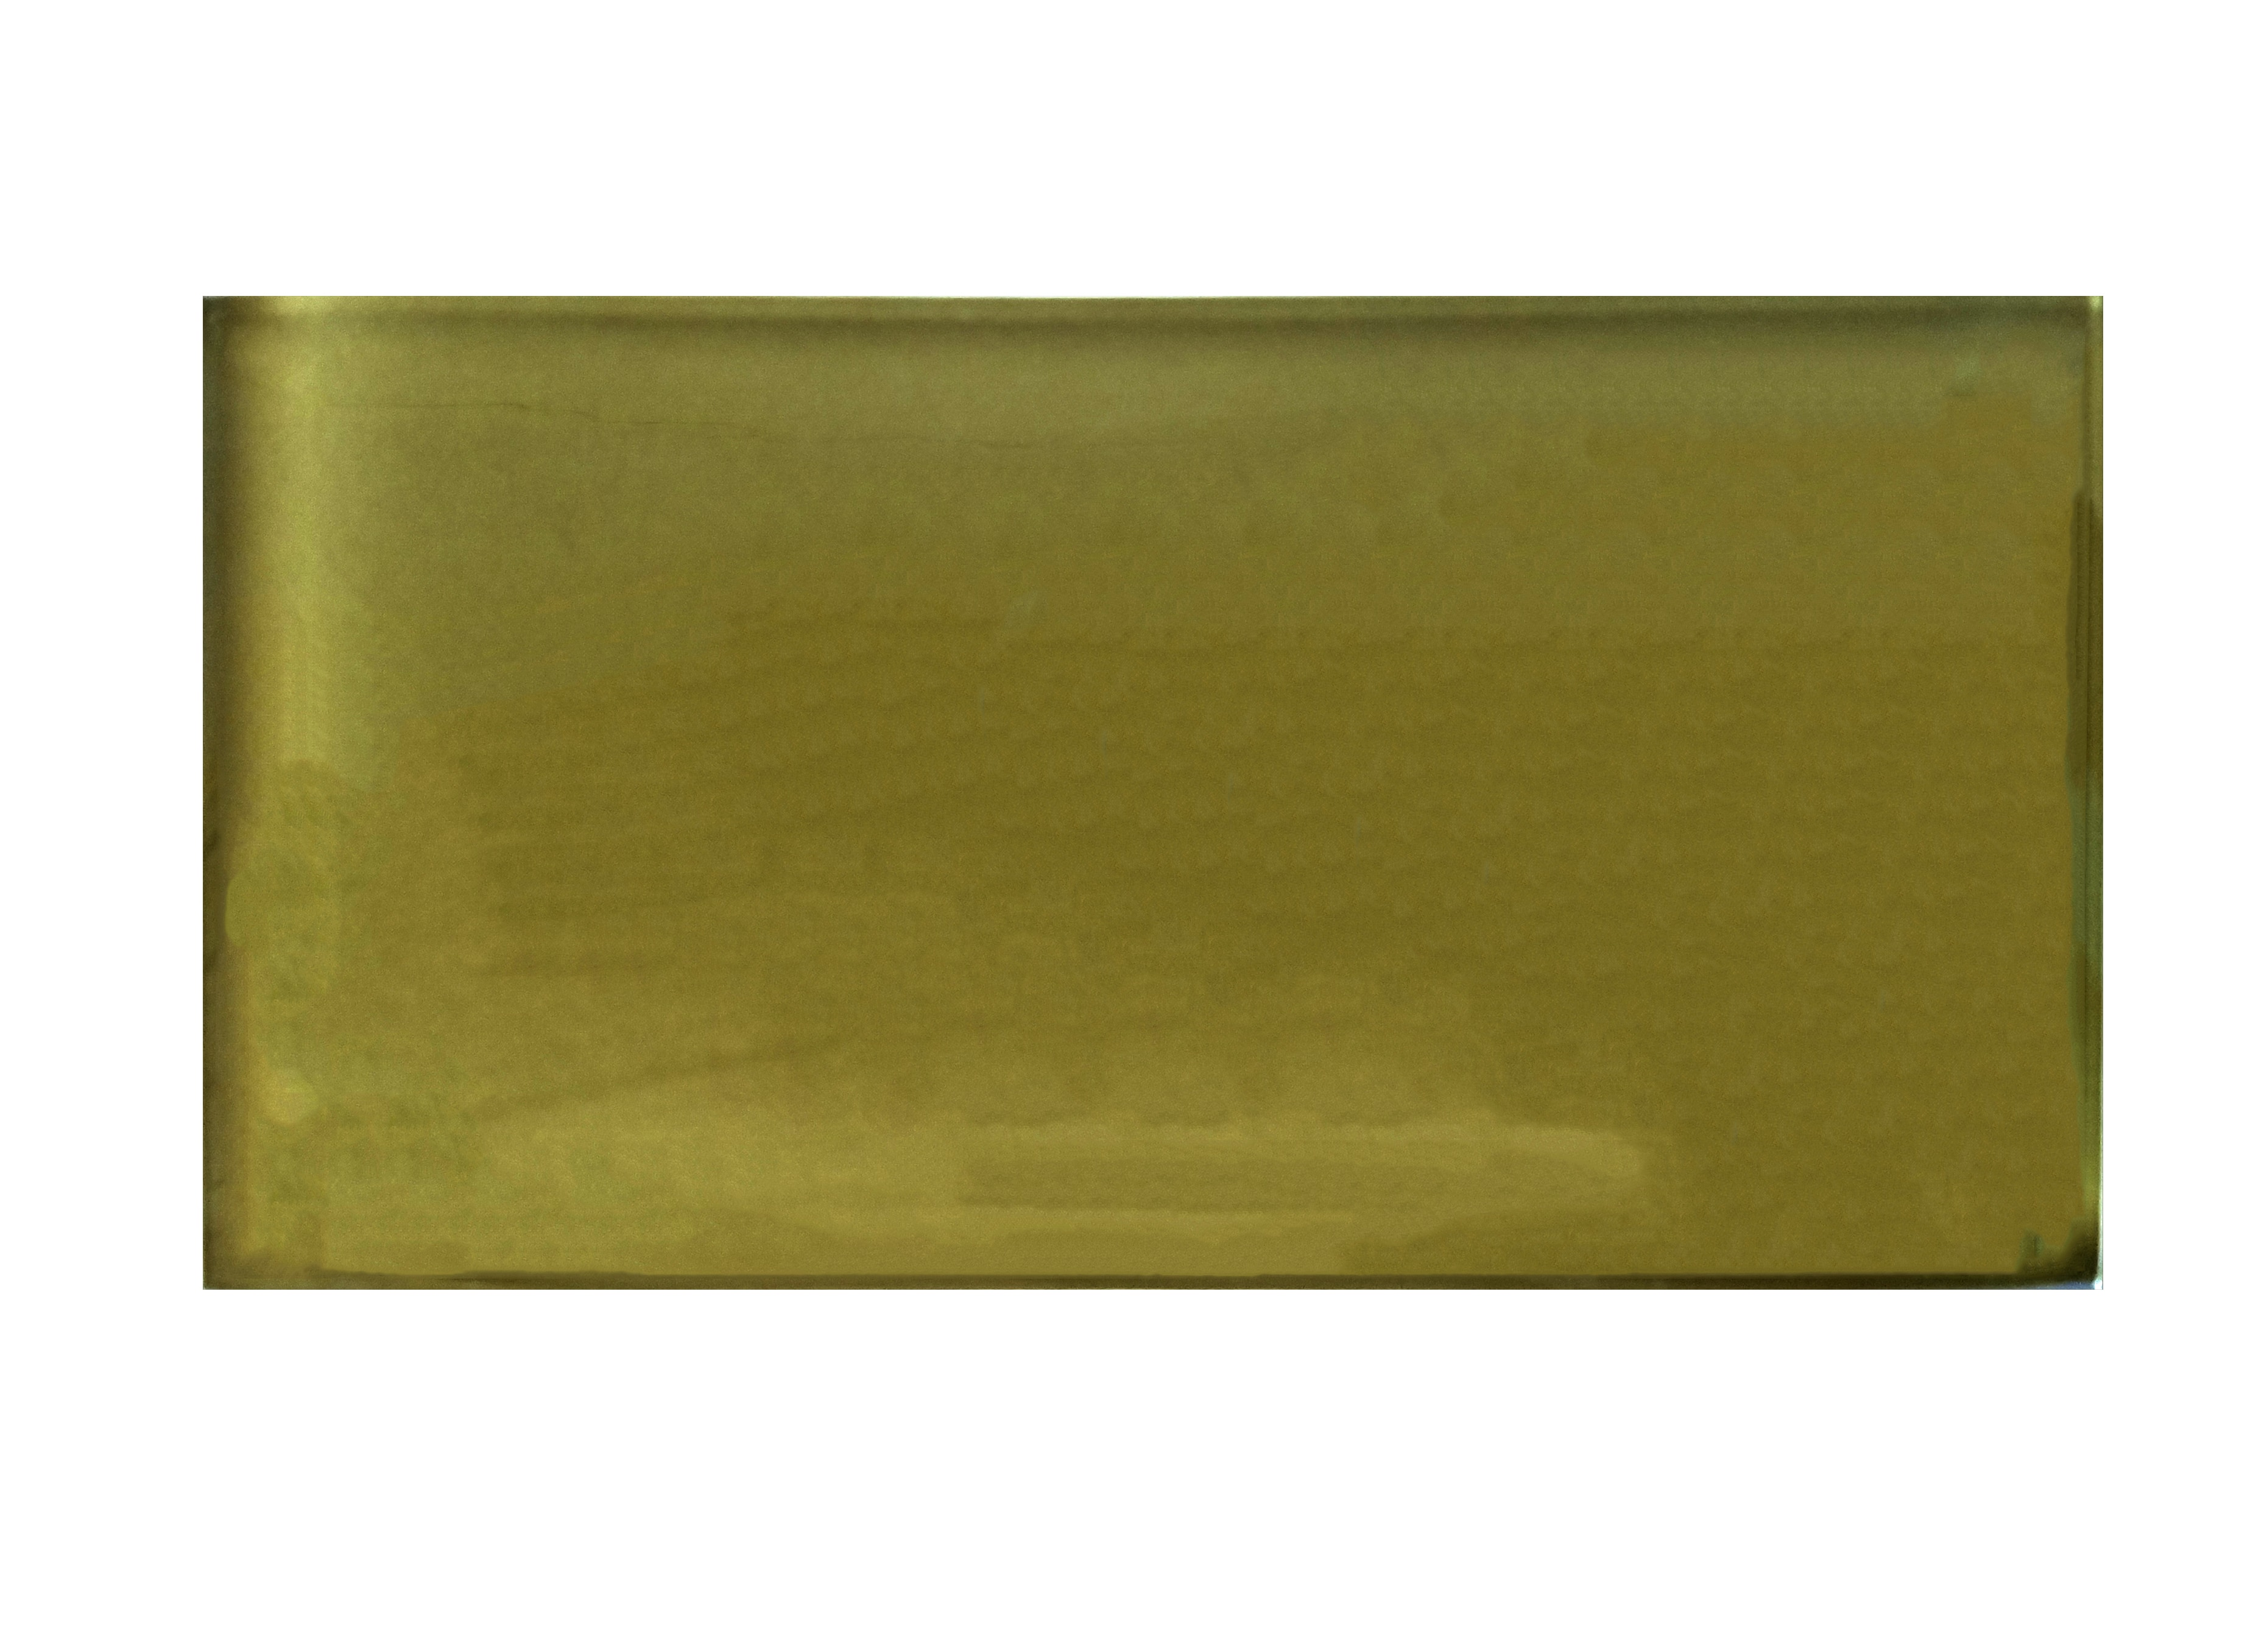 "HI 08 (76x152) - Olive / 3""x6"" Autunno HI 0"